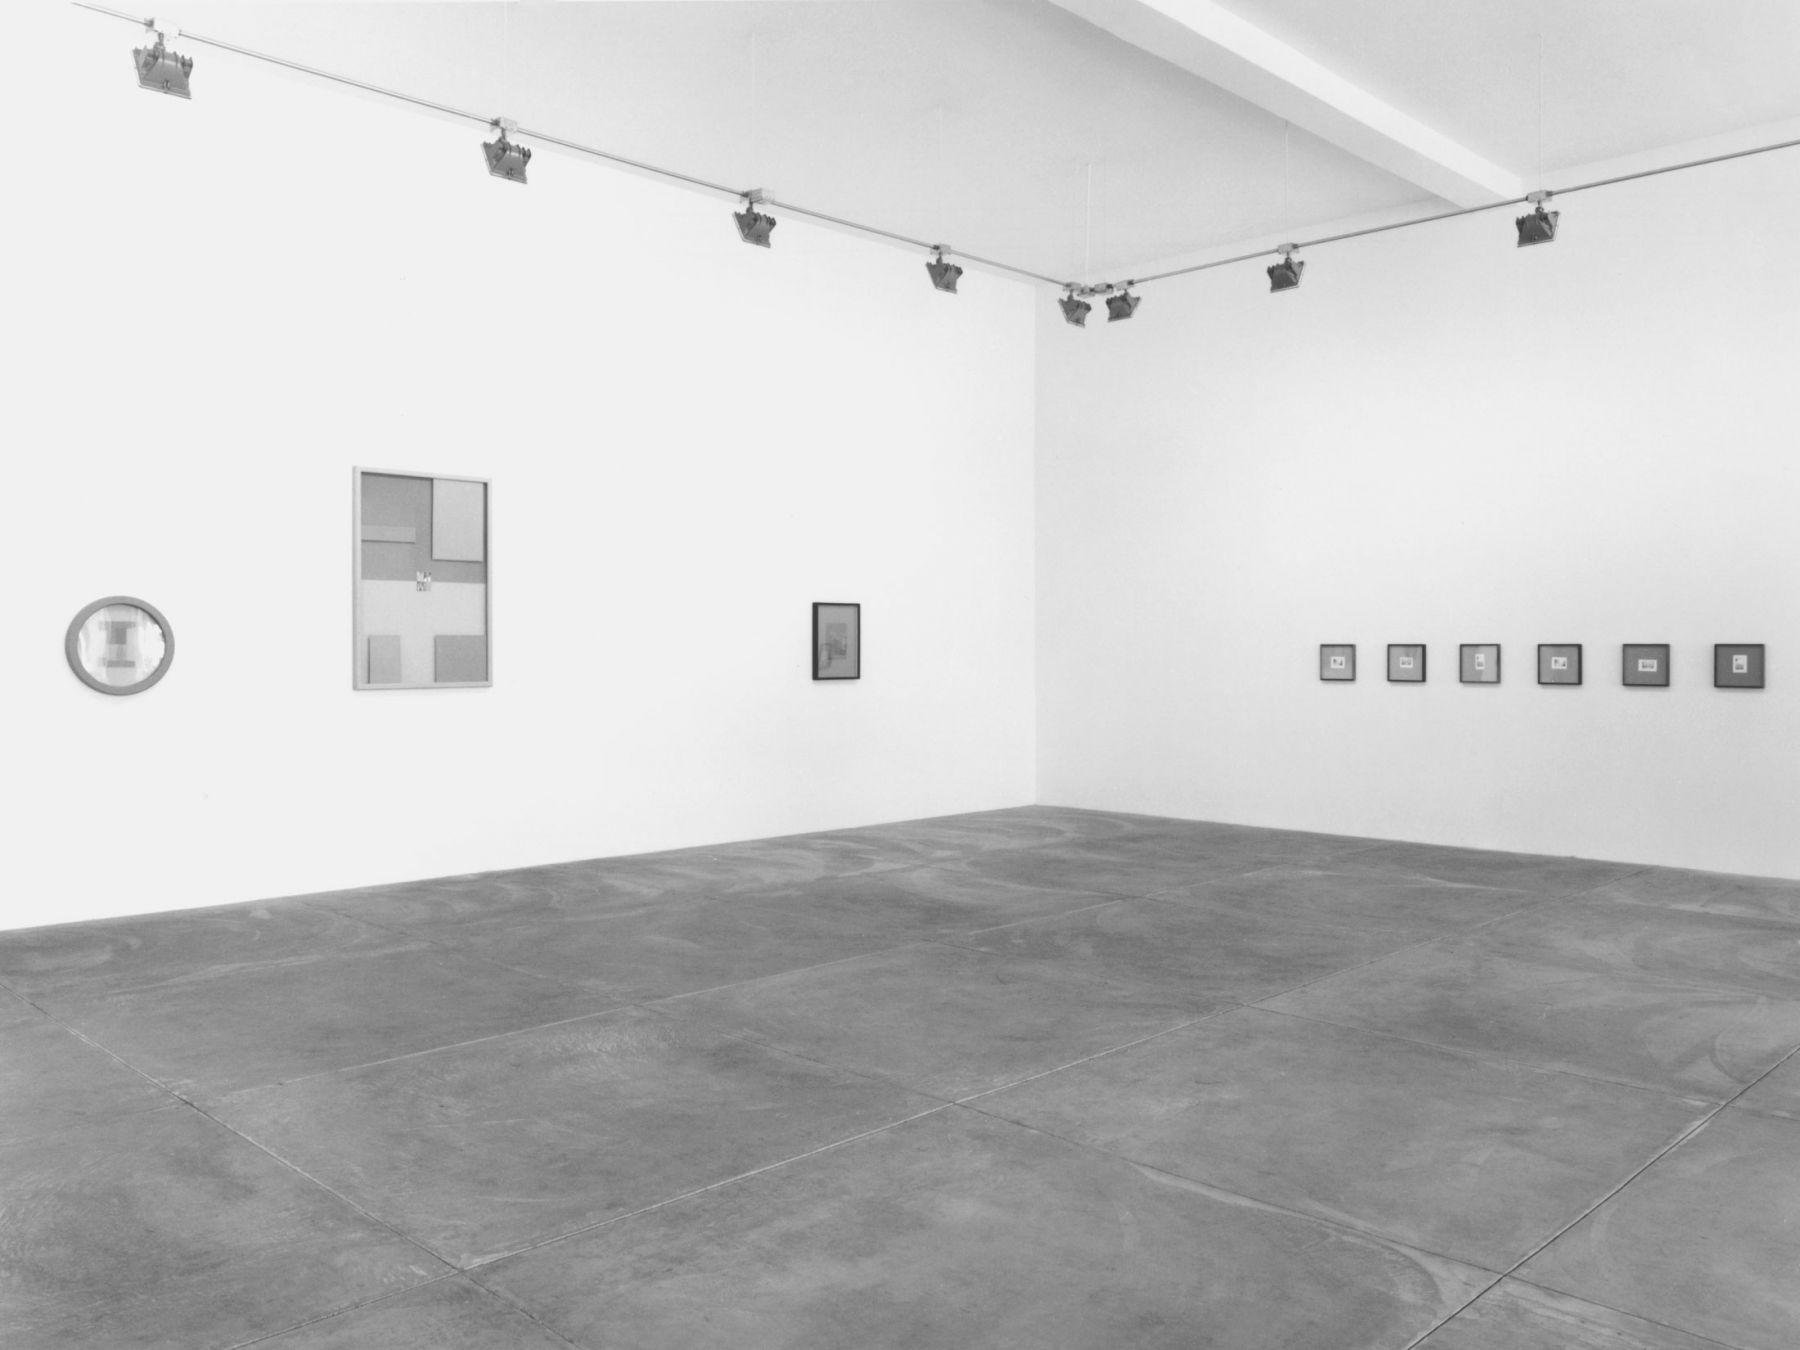 Jorge Pardo, Installation view